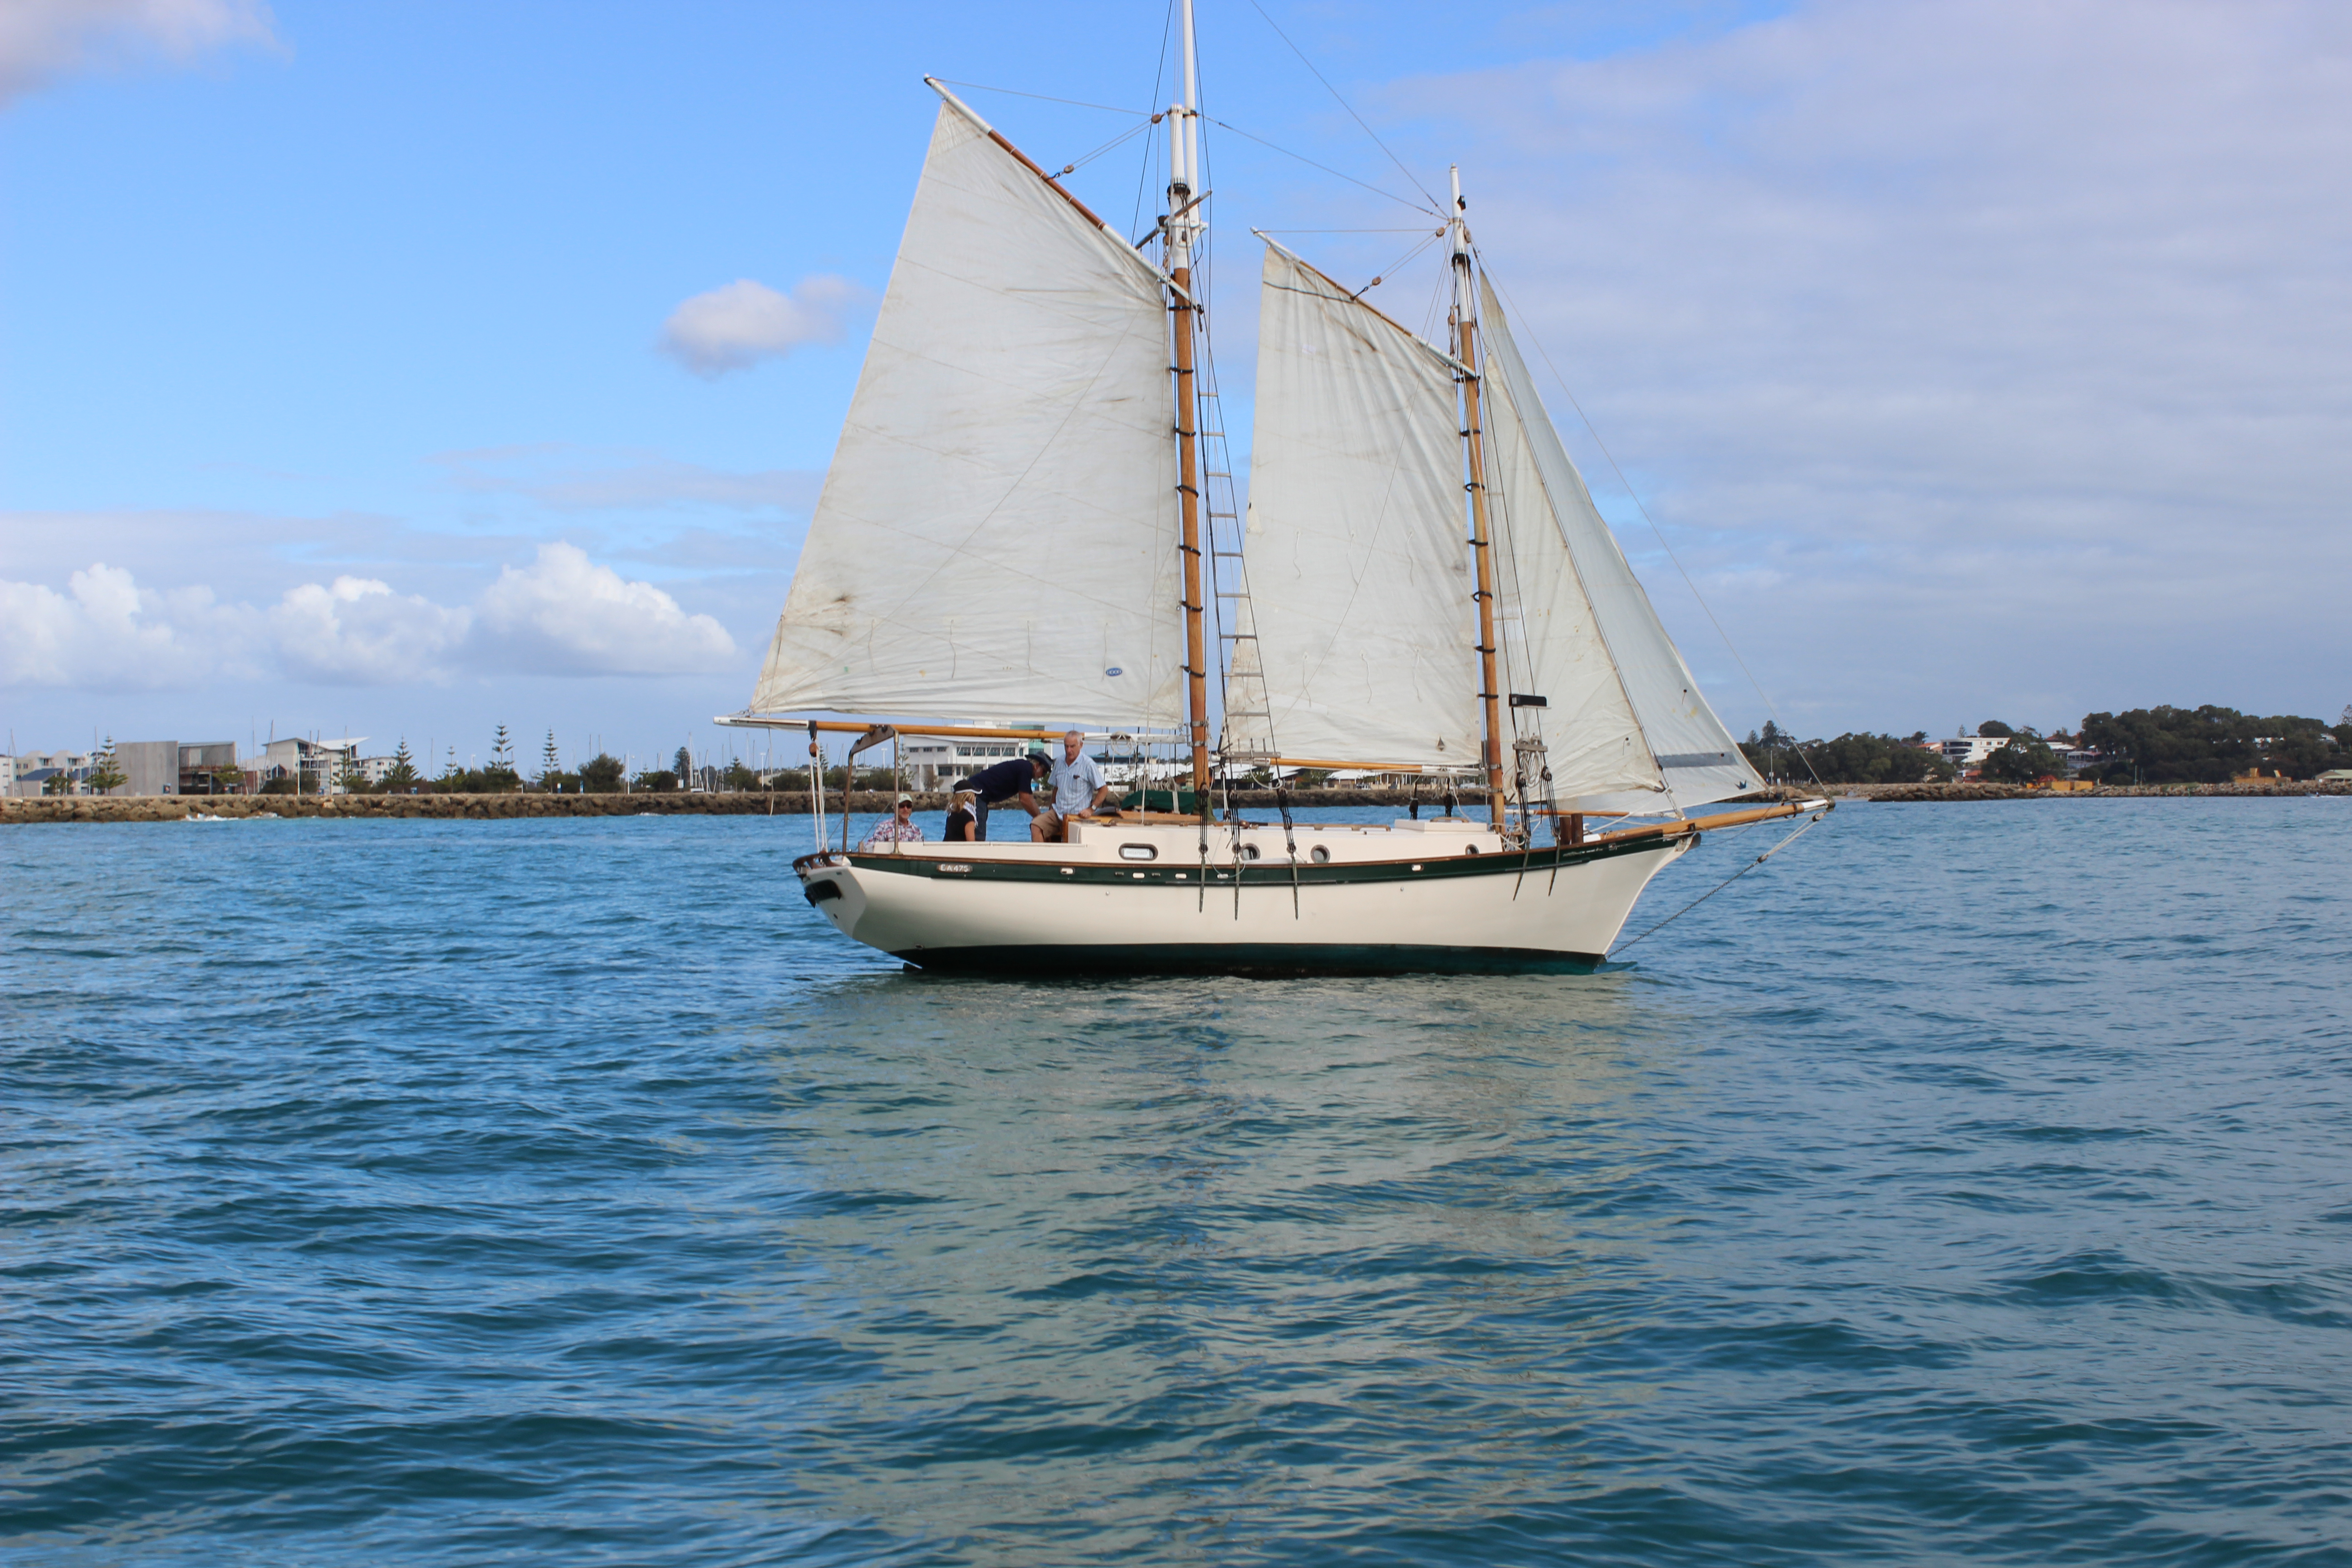 sailing gaff rigged schooner sea trial Mandurah wooden boat yacht